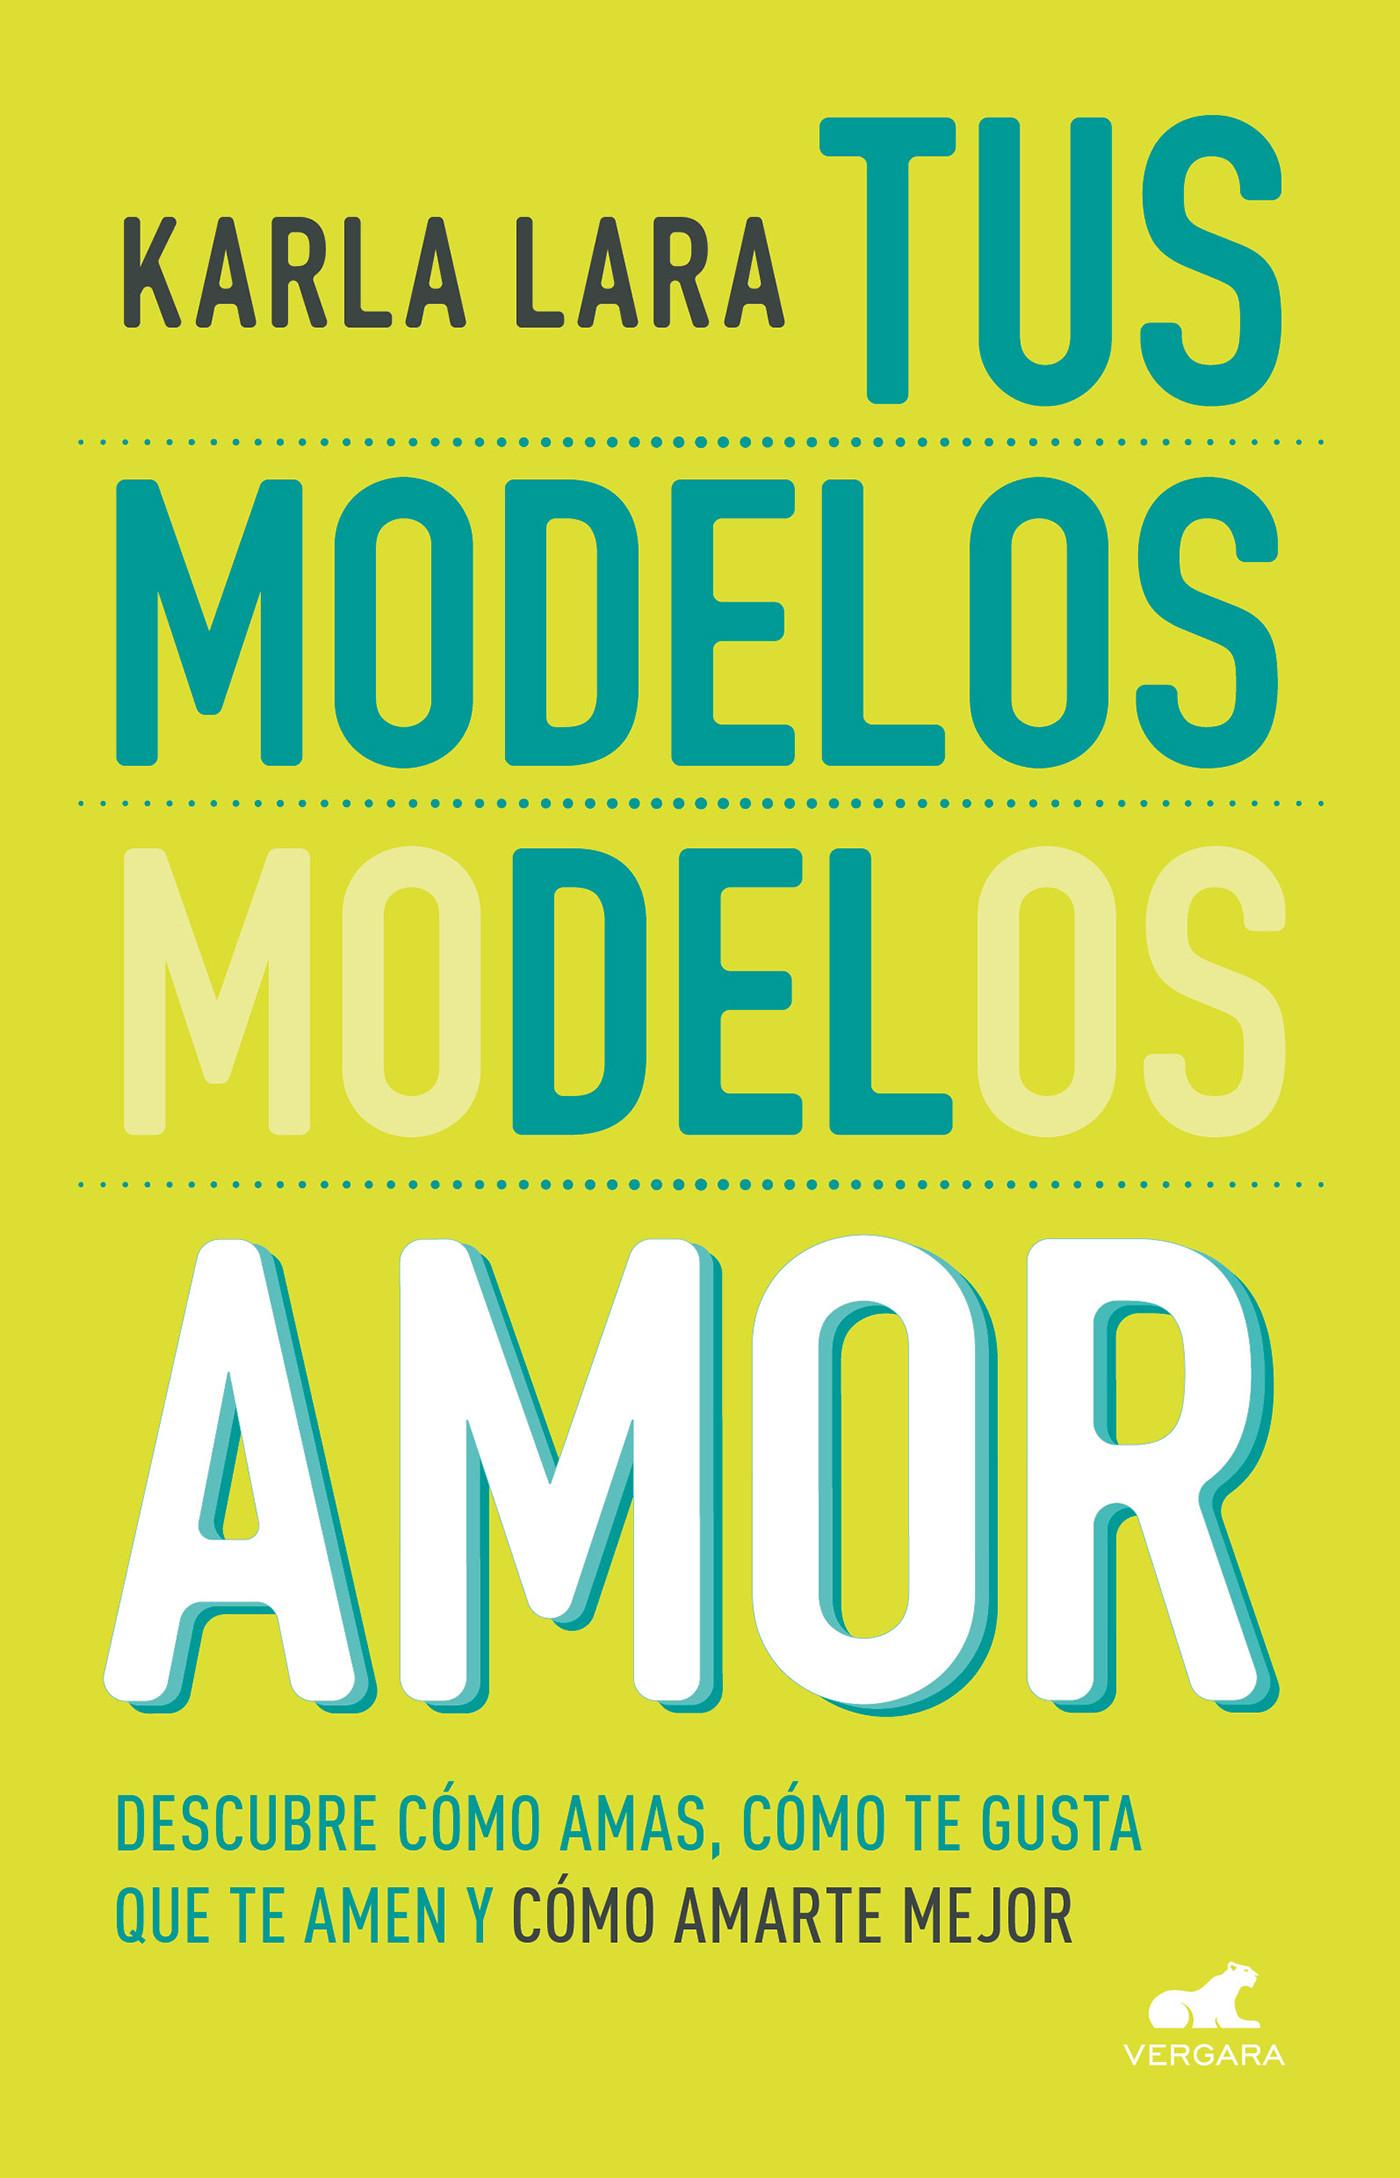 Tus modelos del amor